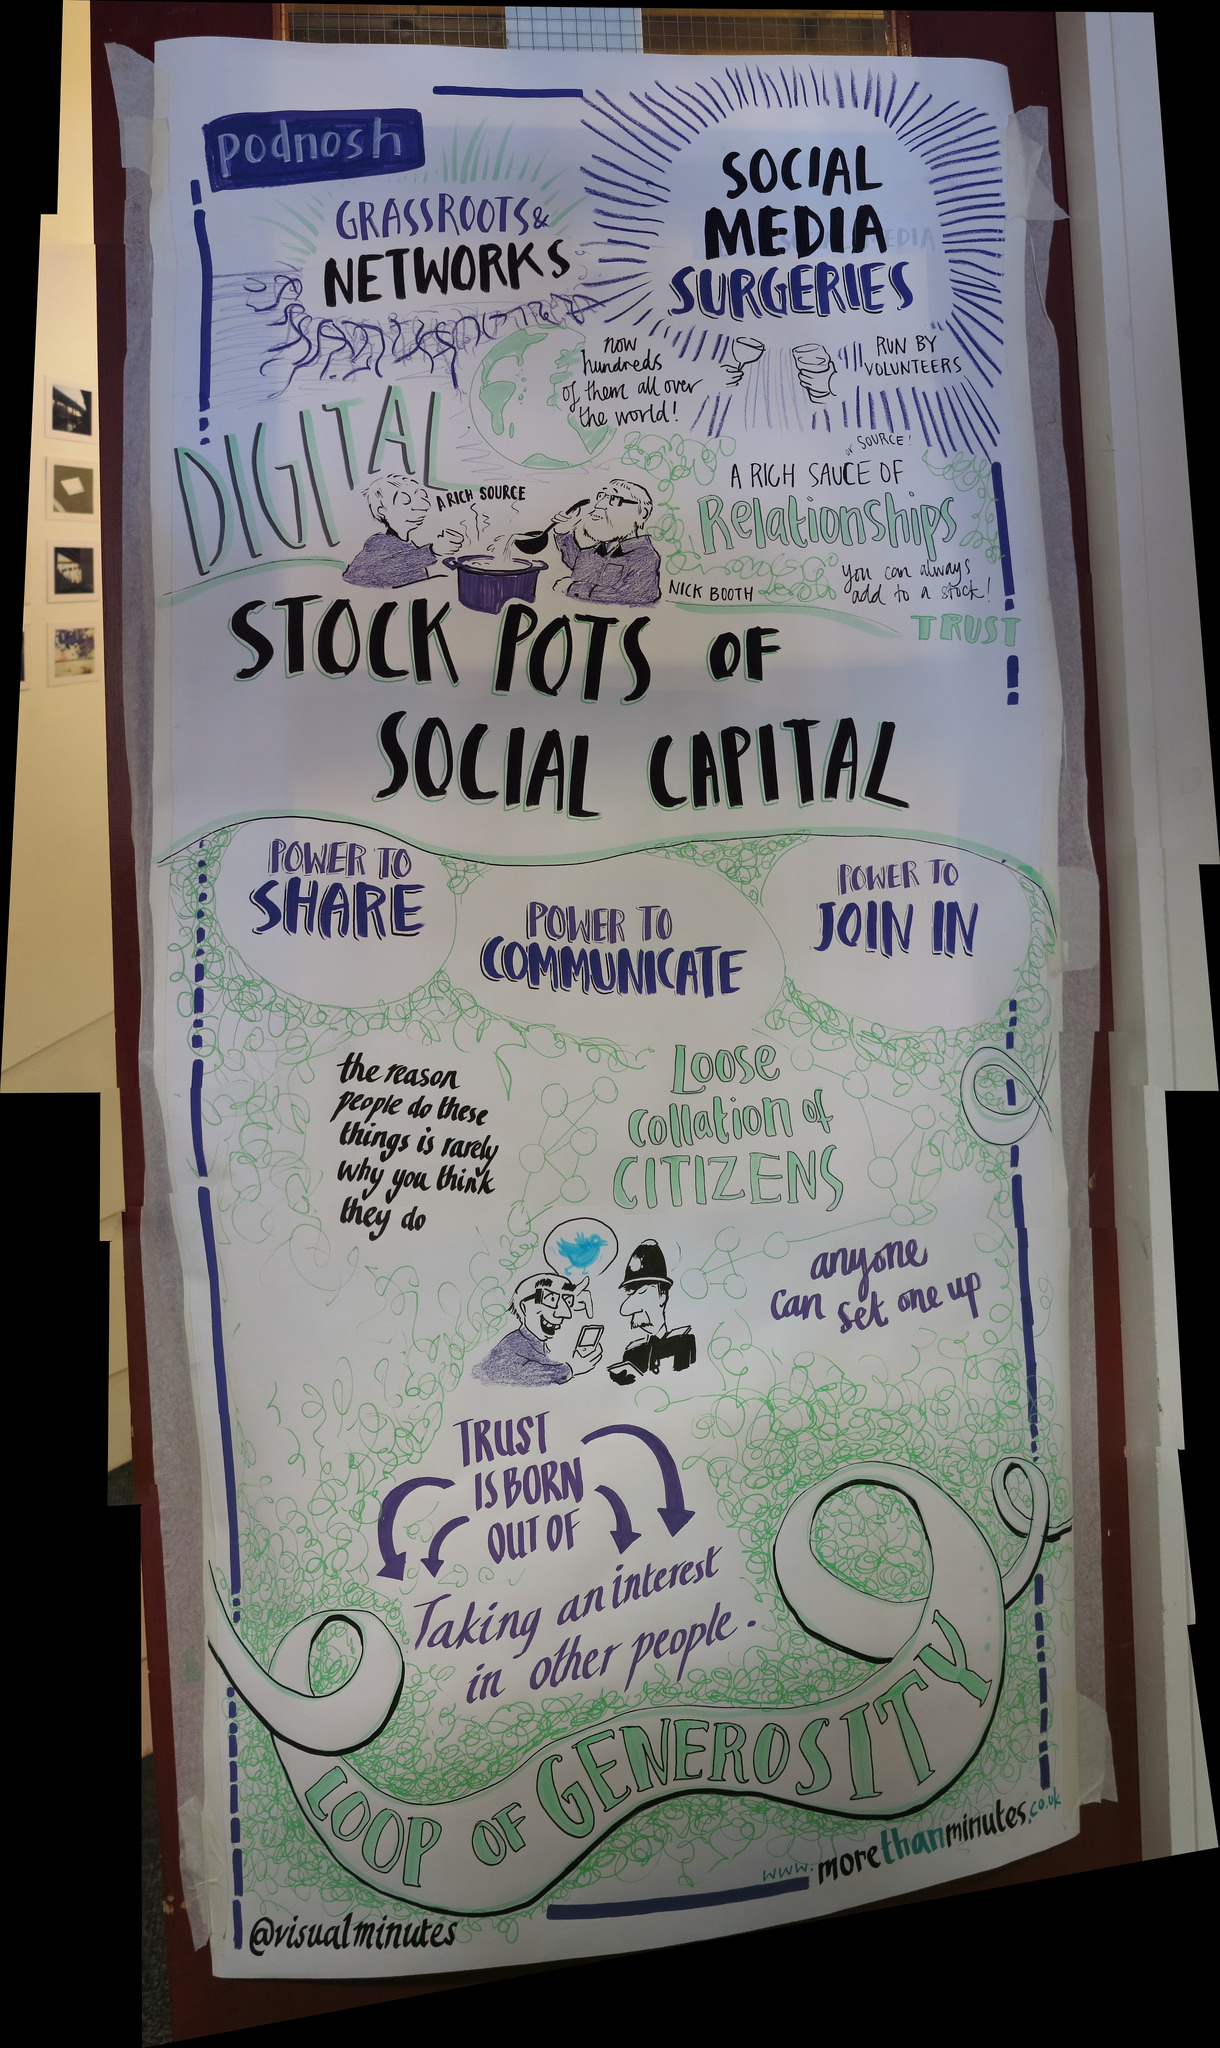 Birmingham's online communities - (digital) stockpots of social capital